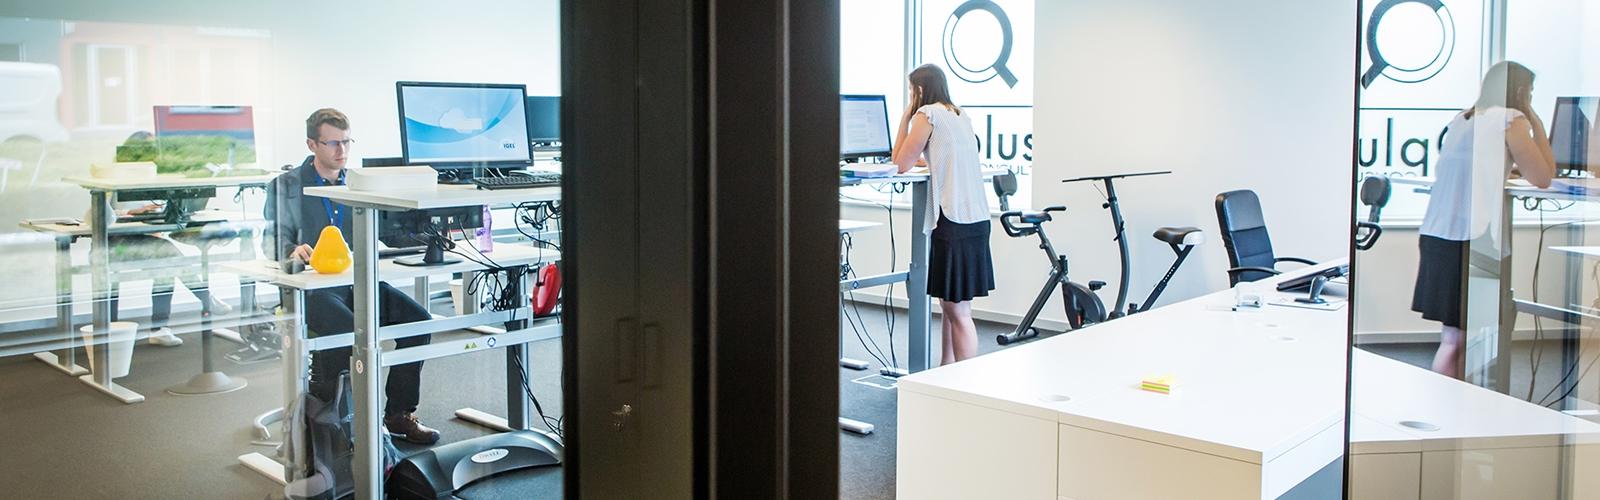 Qplus Office Working